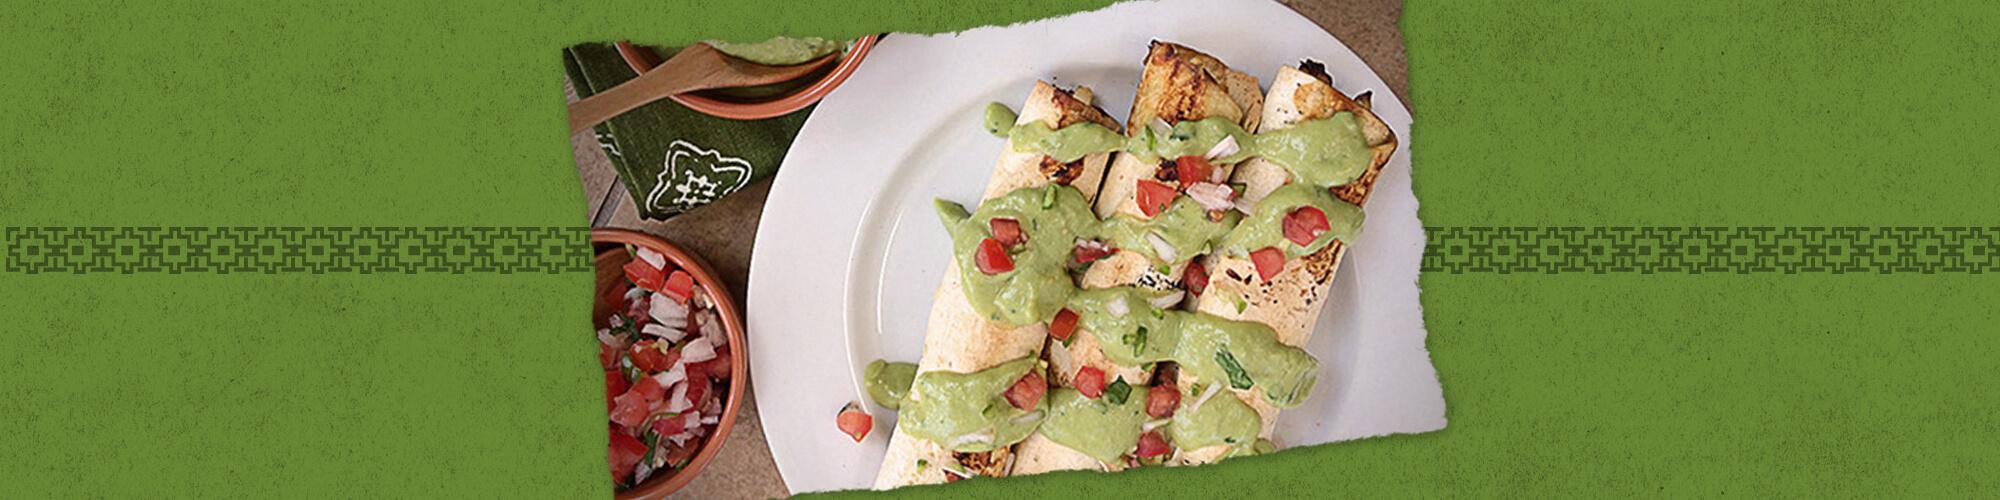 Salsas baked taquitos